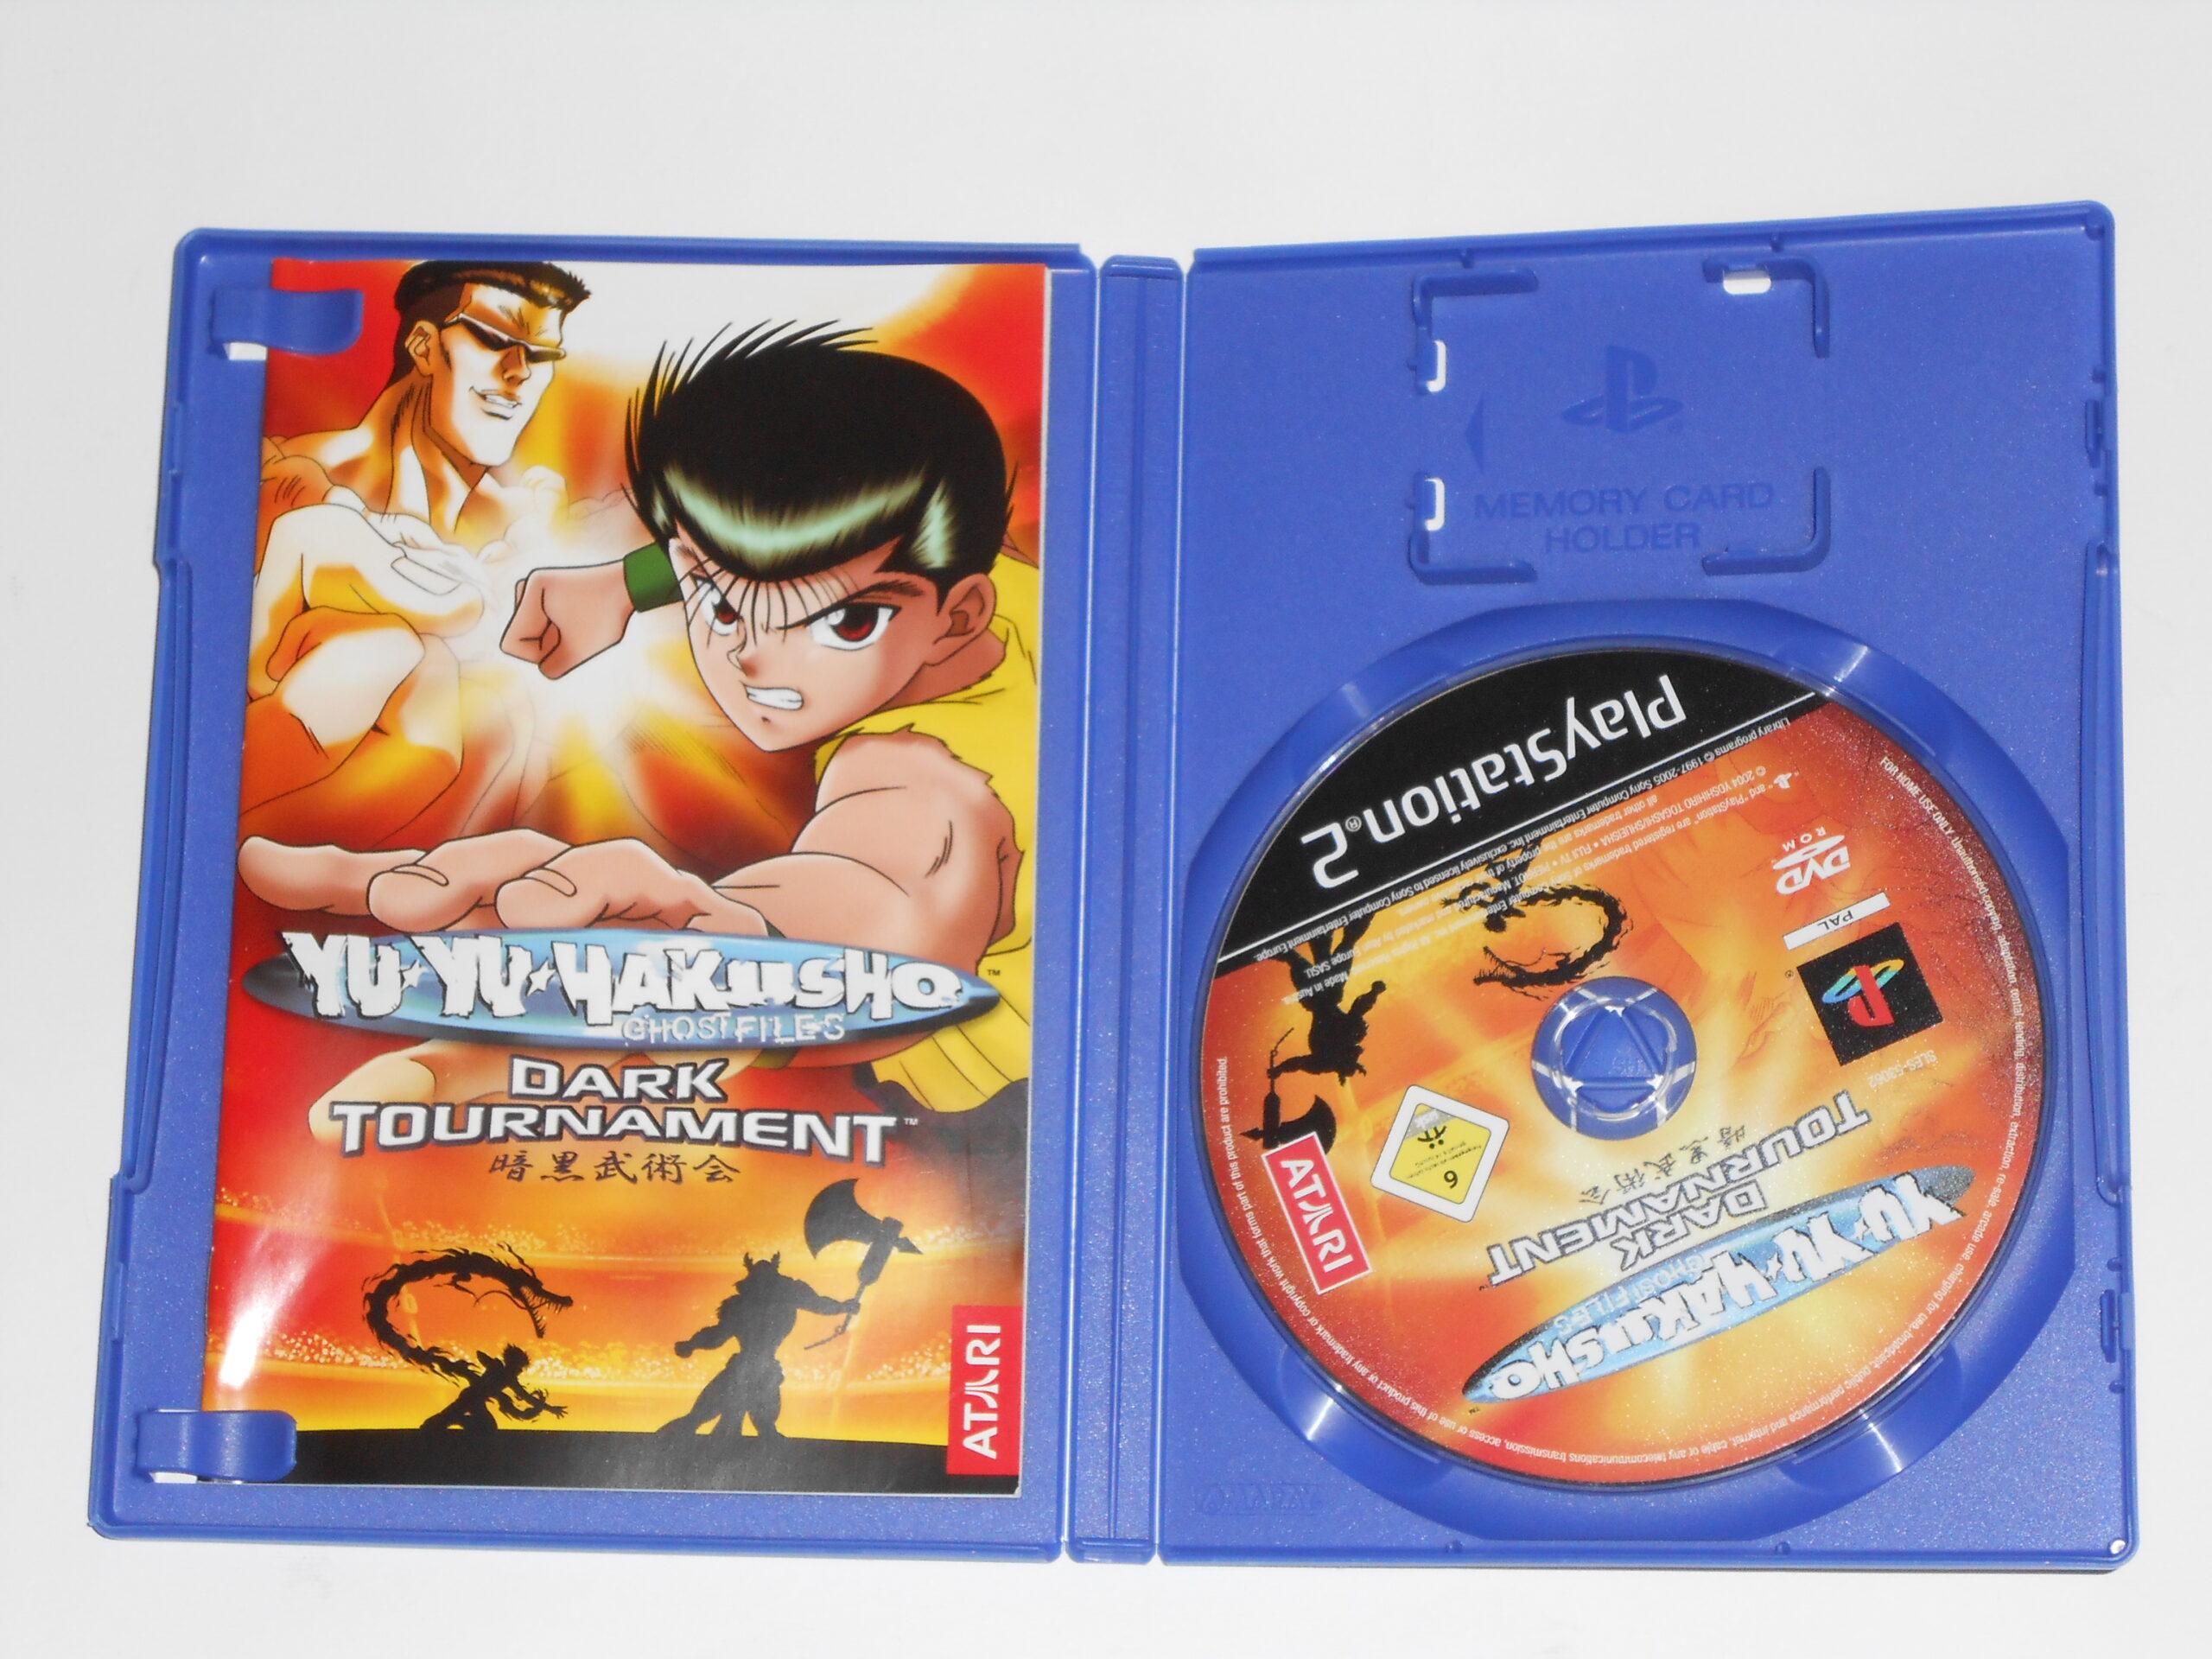 Vendo Yu Yu Hakusho Dark Toournament per Play 2